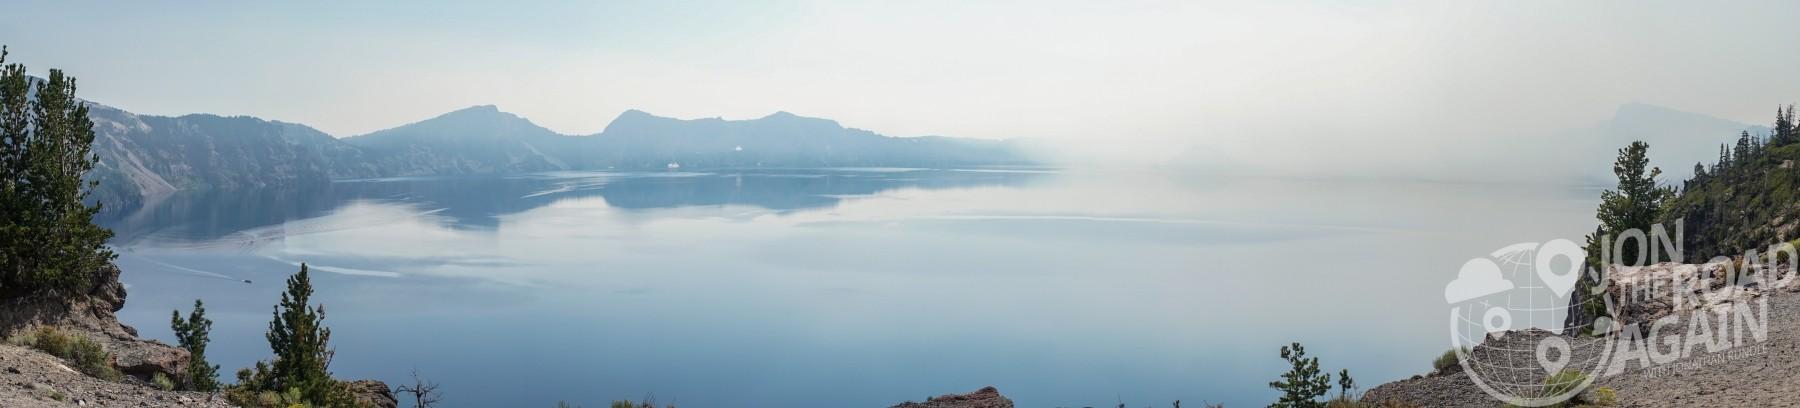 crater lake panorama with smoke